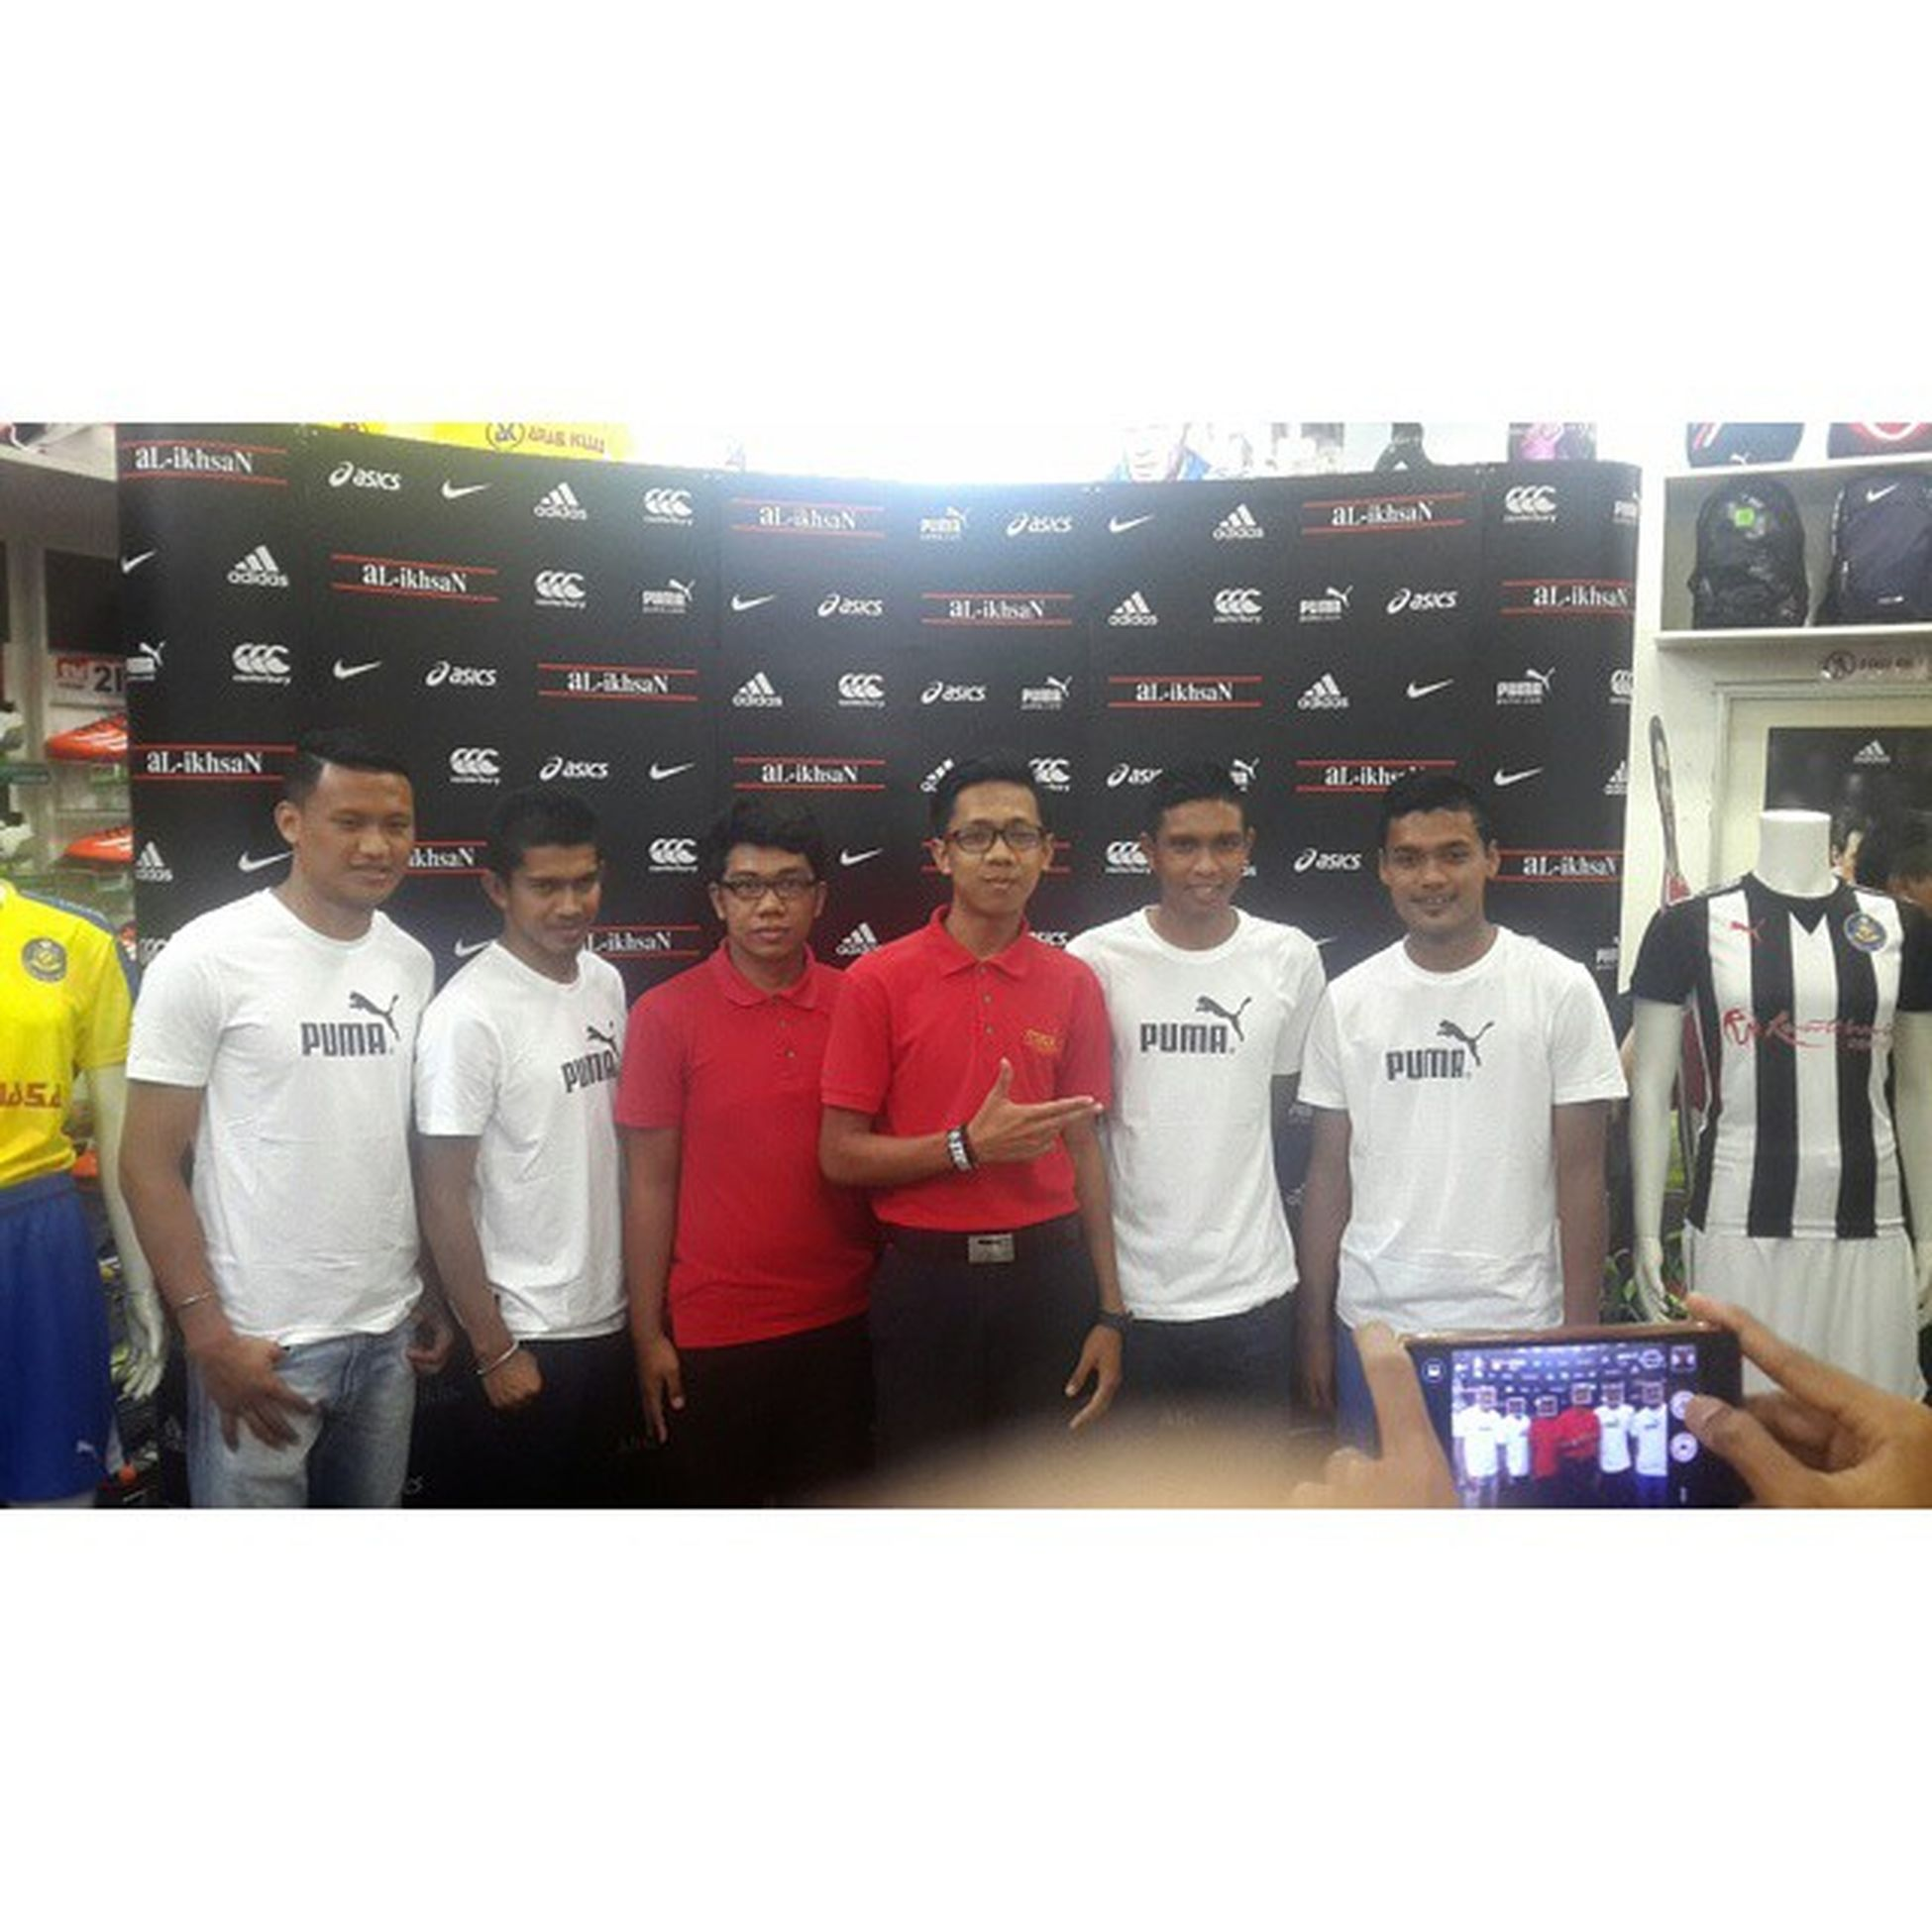 Player²Pahang Darul Makmur!!! Hogohh Pahang hogohhhh!!!! Hogohpahanghogoh Darulmakmur Puma Pahangfa